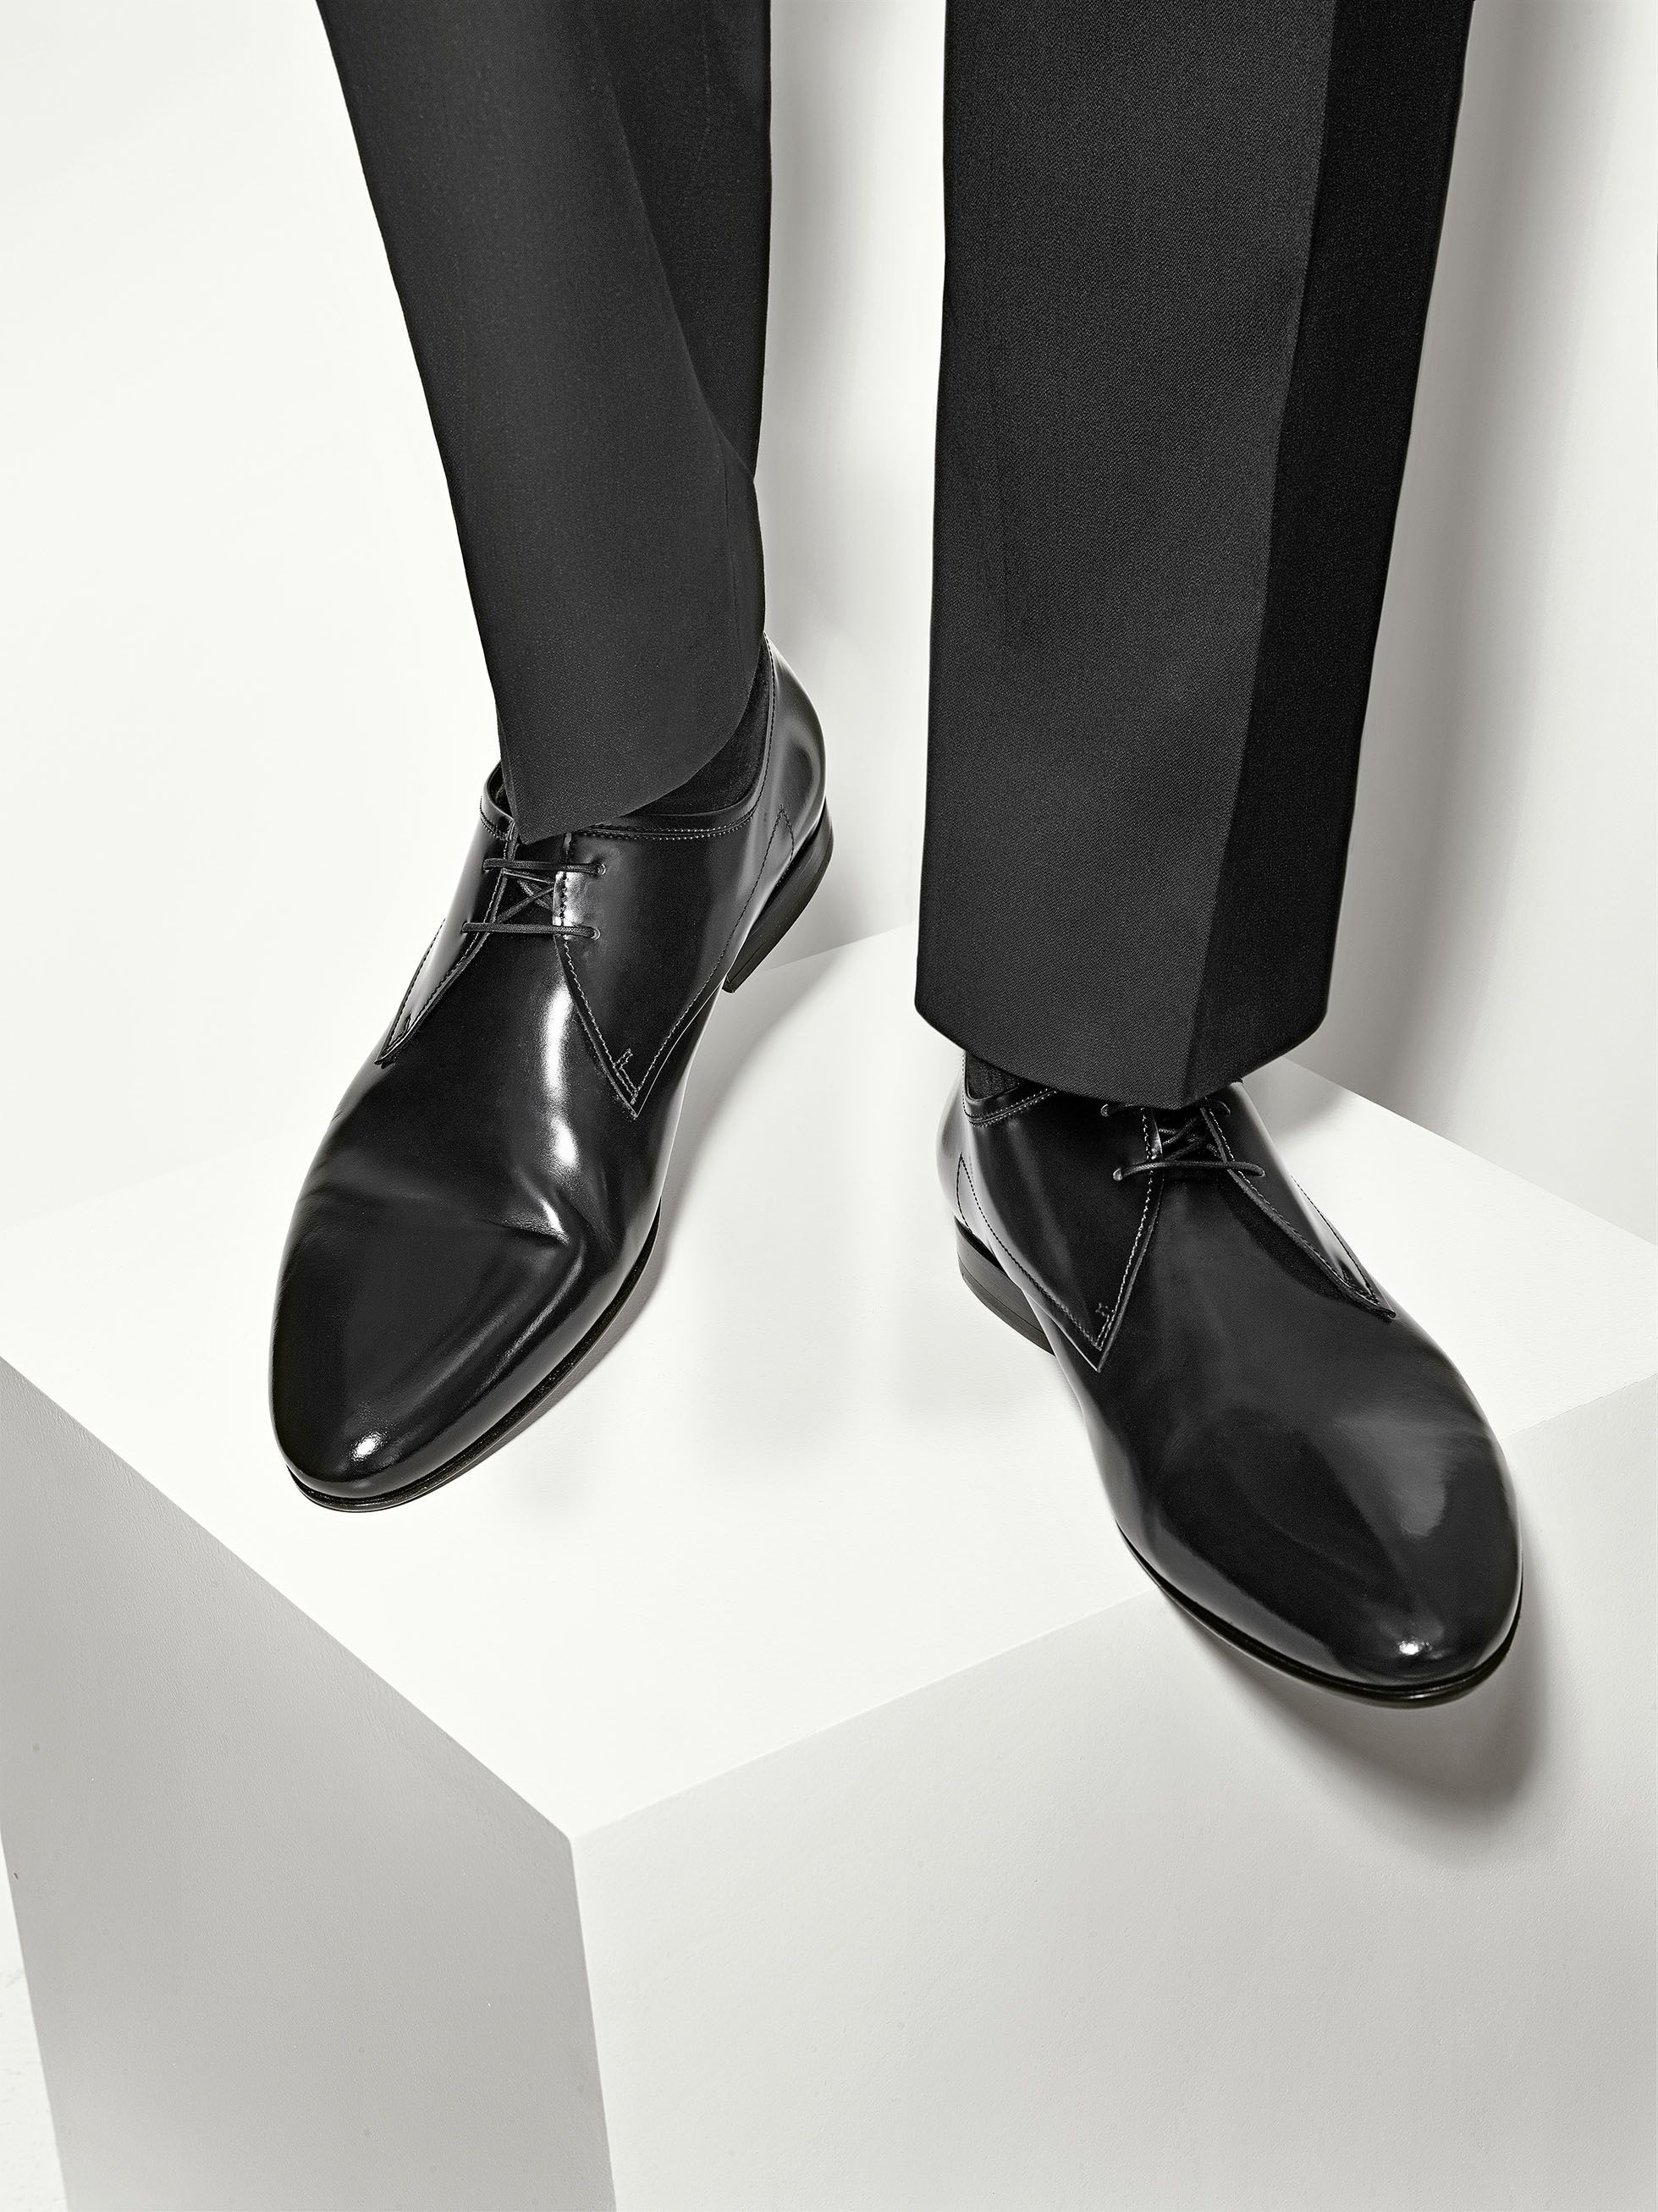 Hugo boss shoes, Dress shoes men